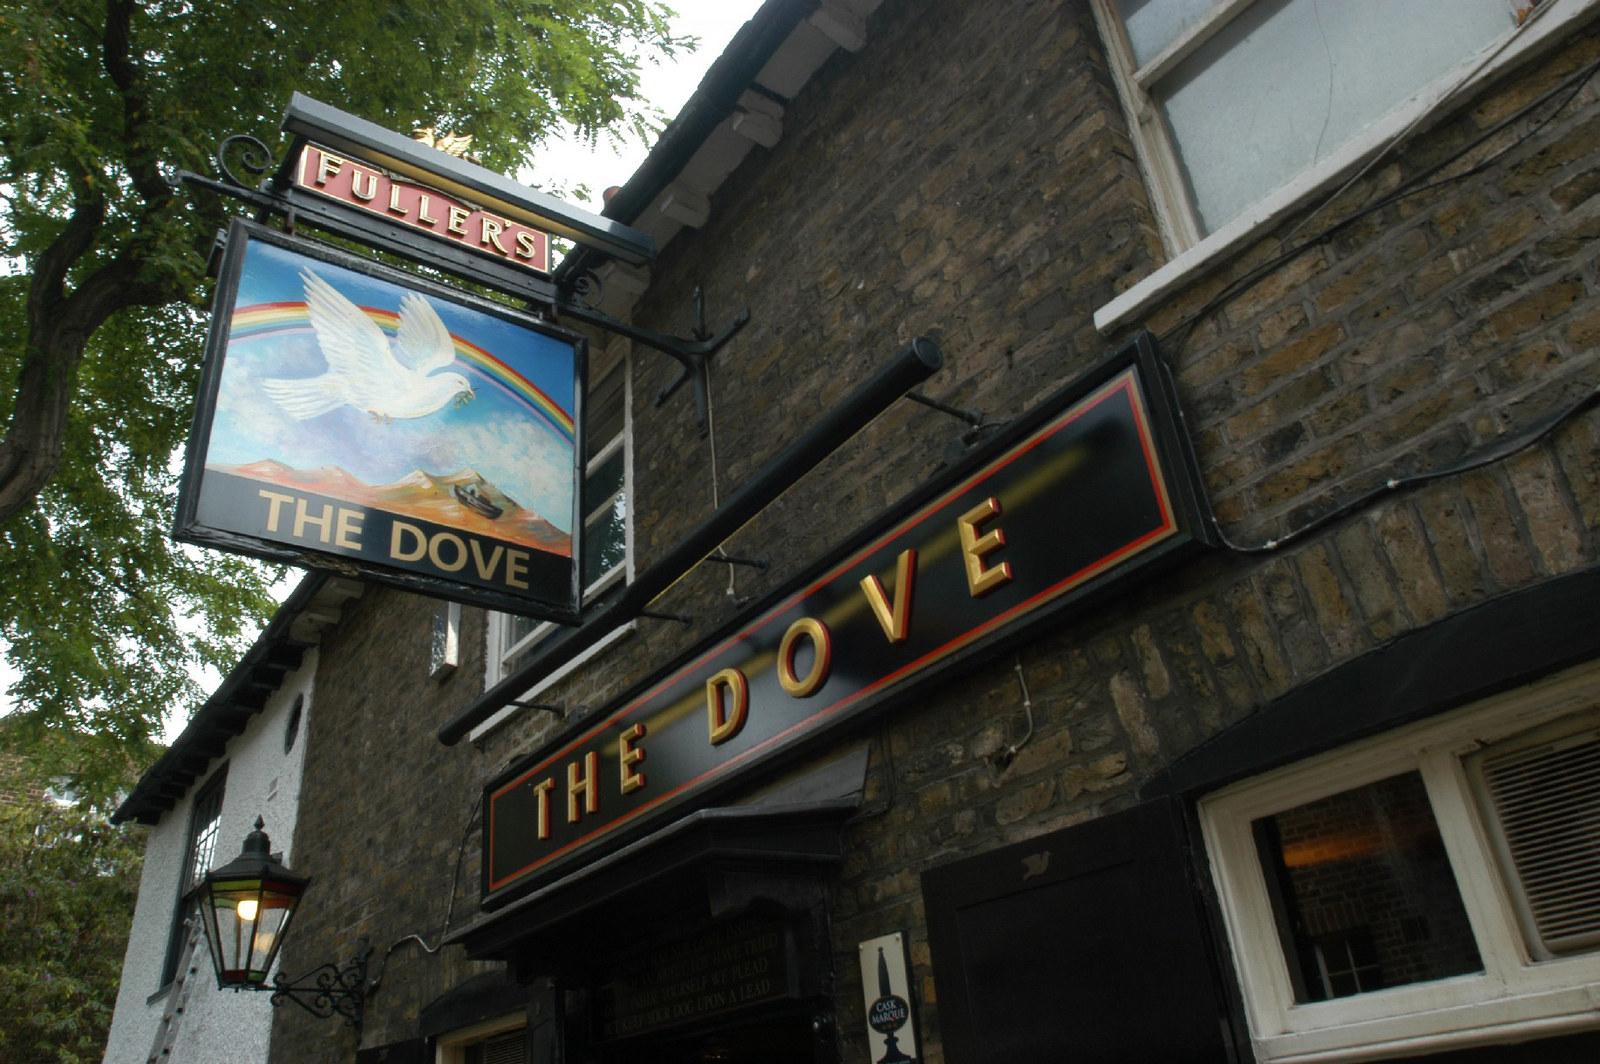 The Dove - Ext 0034v 2 - 300dpi